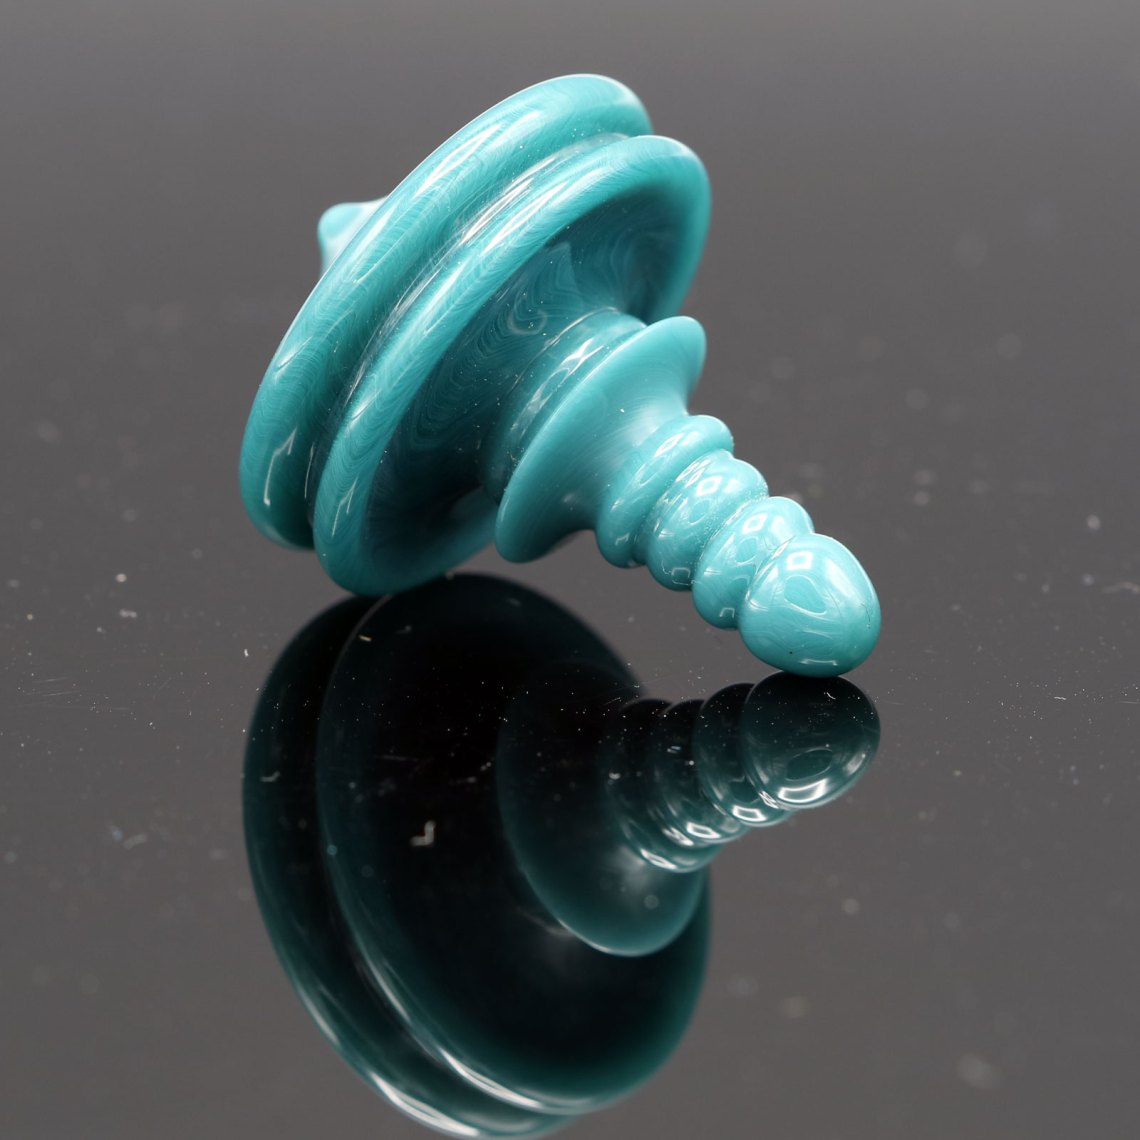 Mike Philpot – Aquamarine Spinning Glass Top